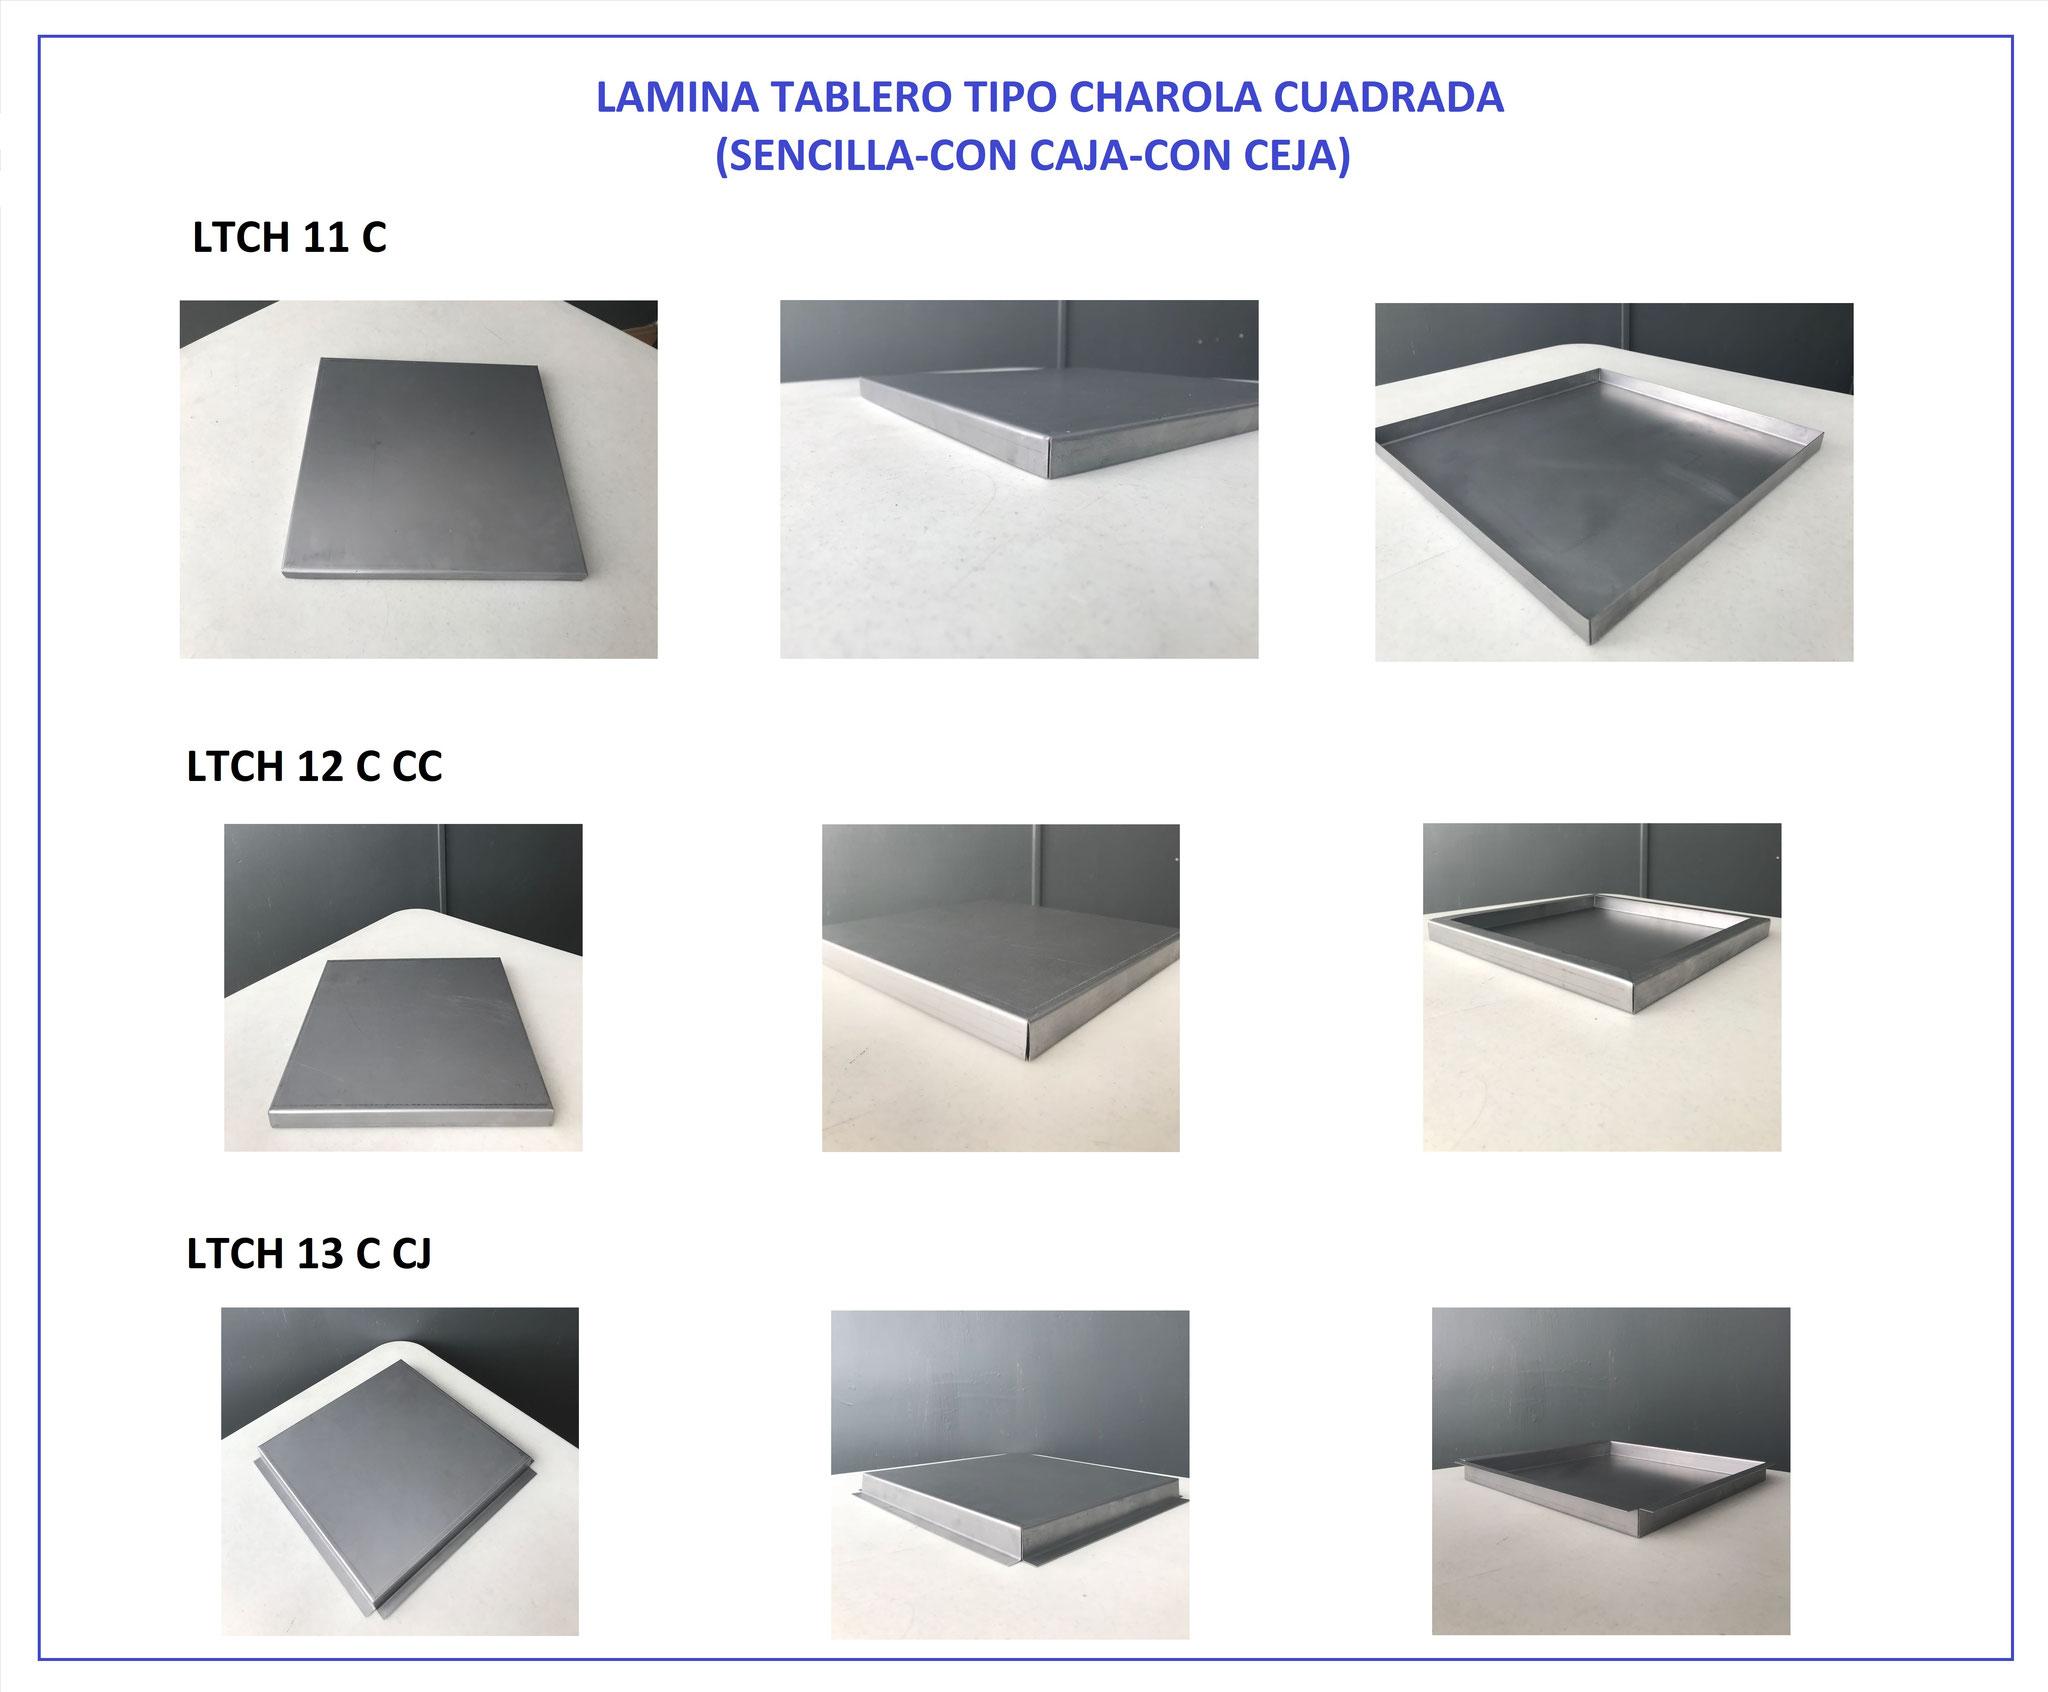 LÁMINA TABLERO PARA PUERTA TIPO CHAROLA CUADRADA 11